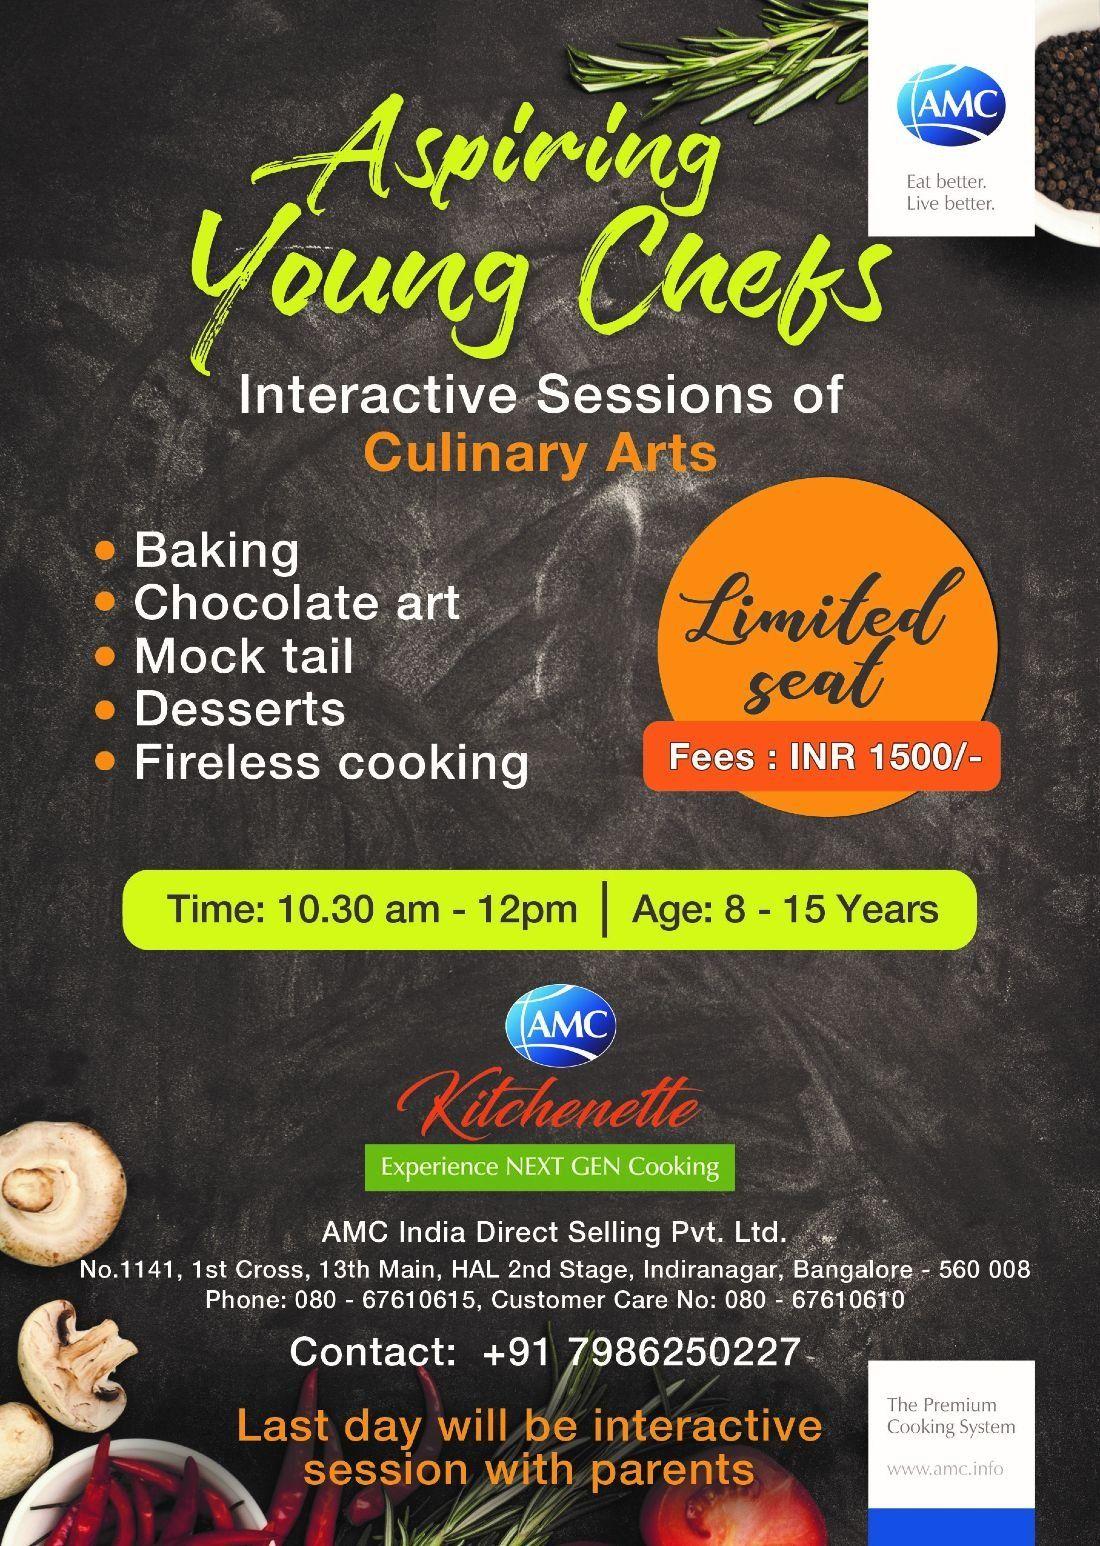 Aspiring Young Chefs | bangalore